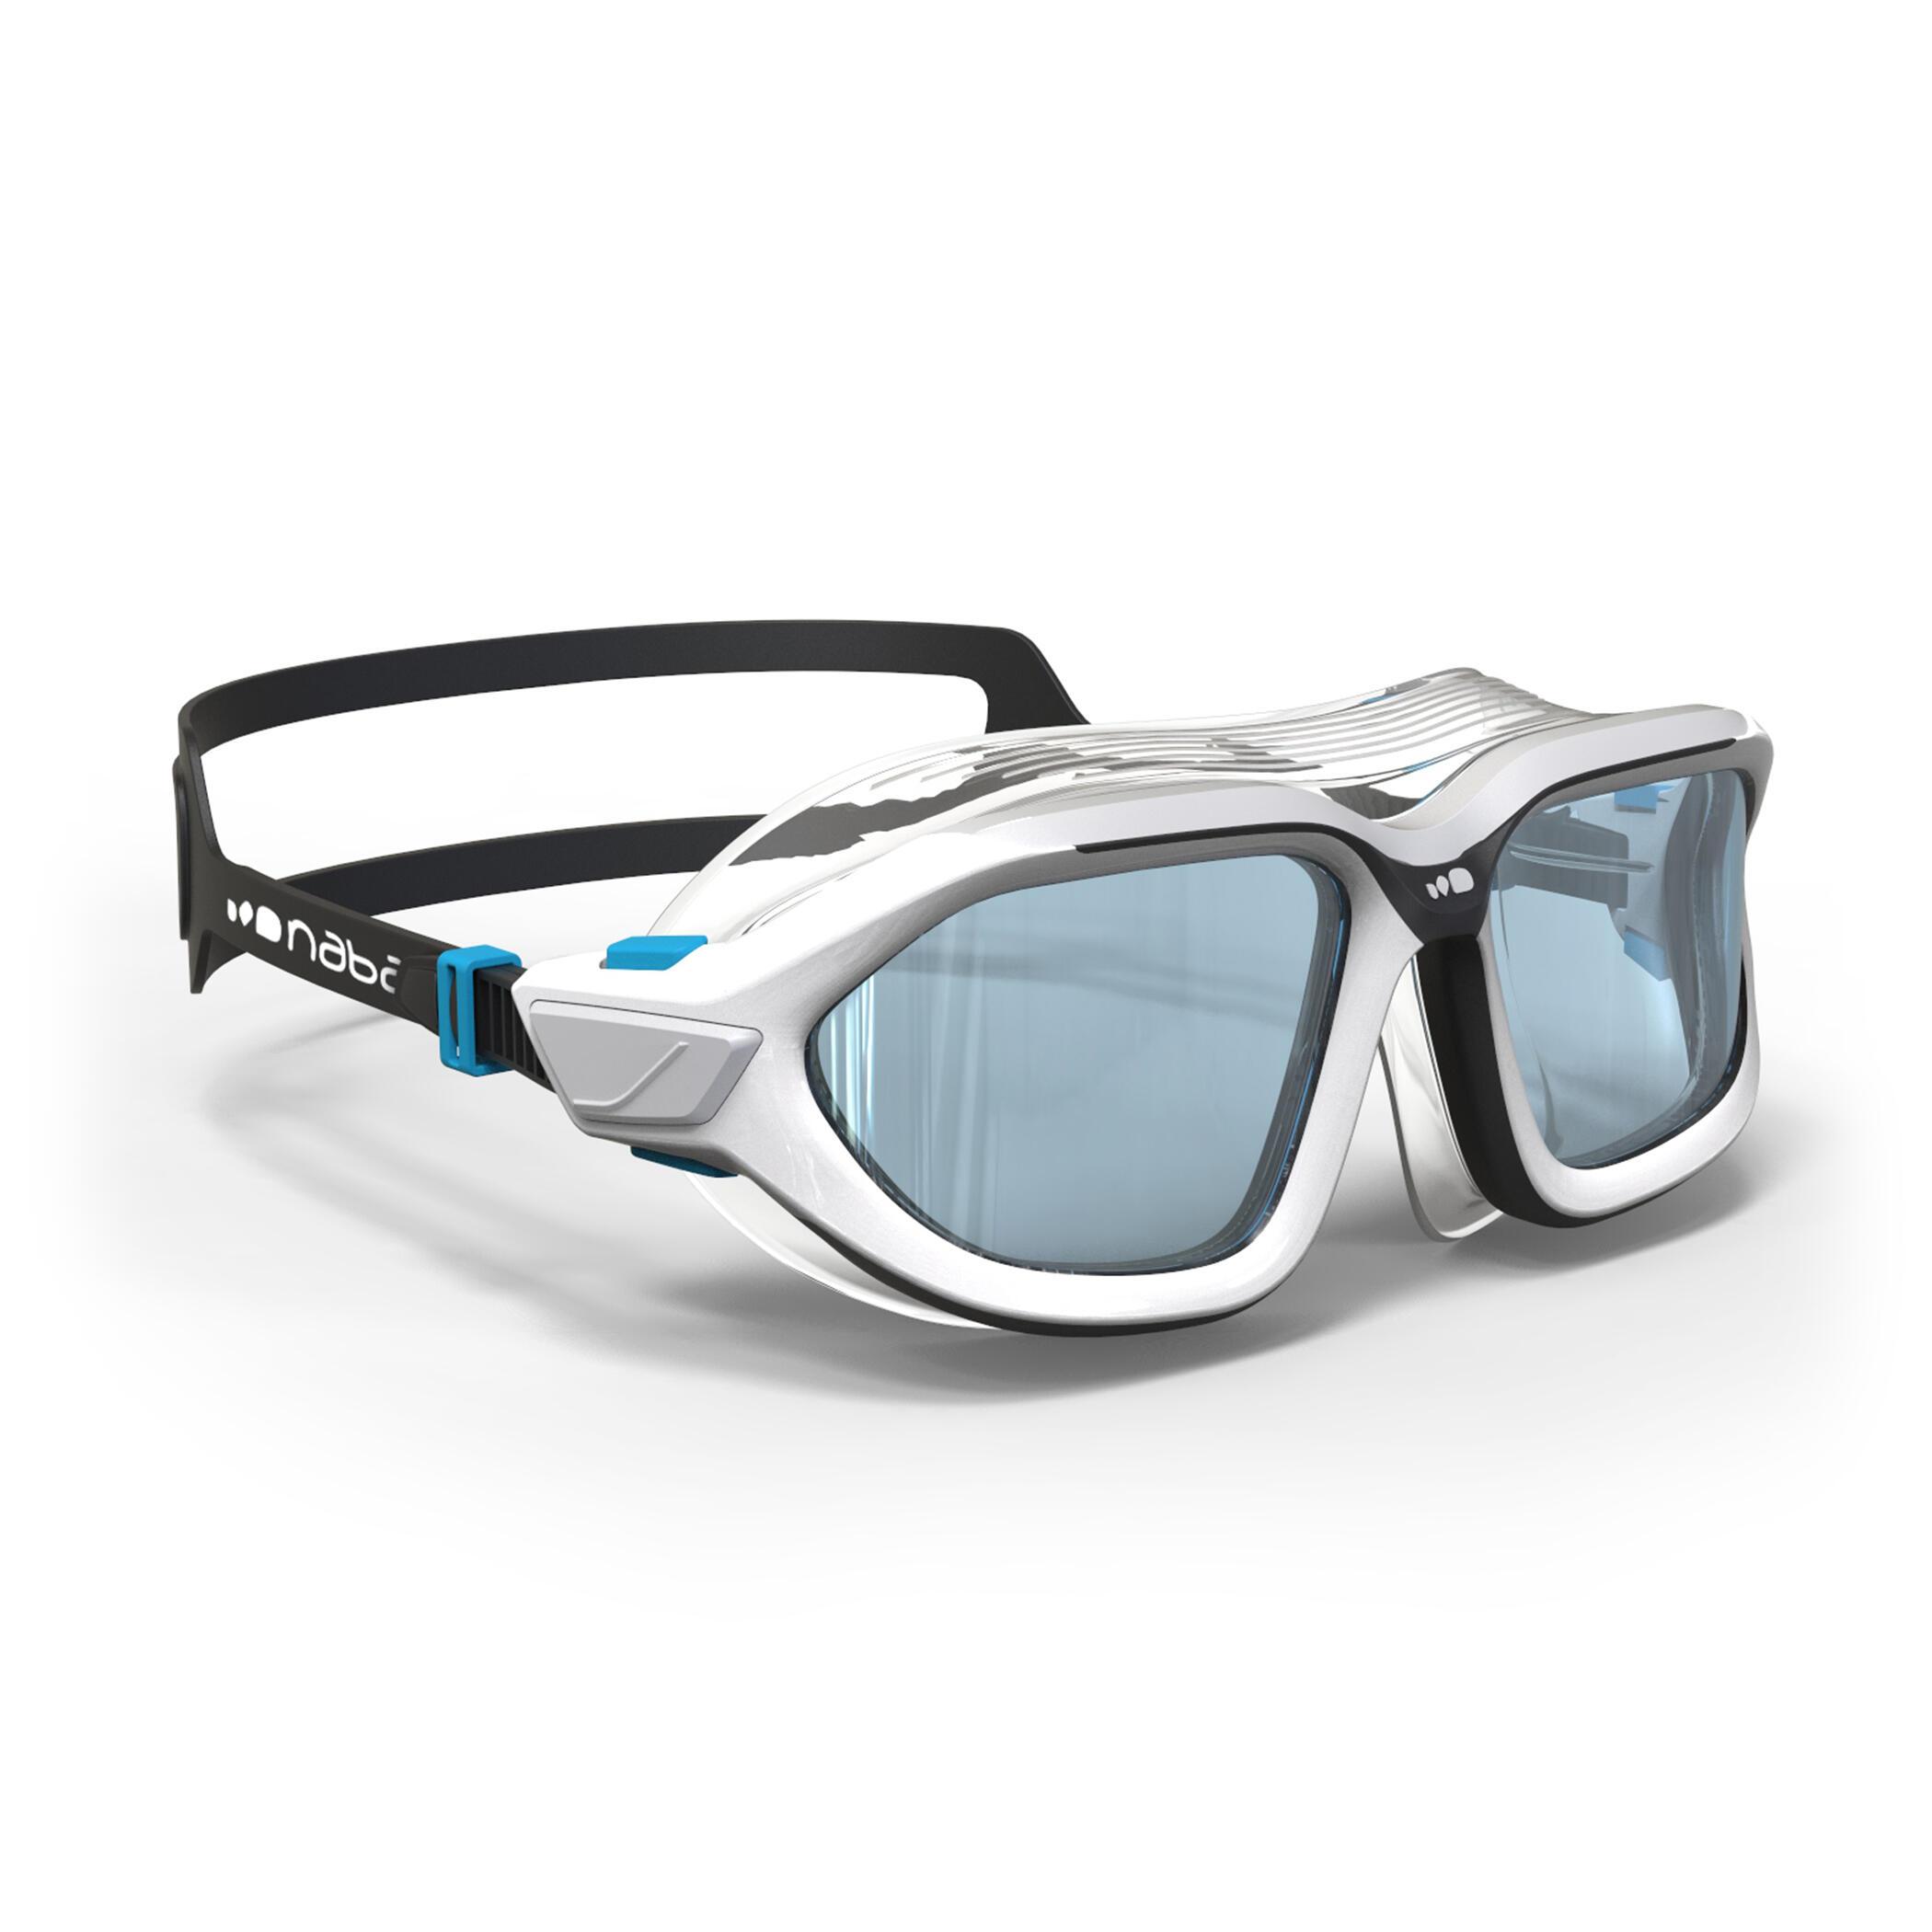 50bd75d4b64dae kopen met korting nabaiji Nabaiji Zwembril Active Maat nabaiji kopen in de  aanbieding